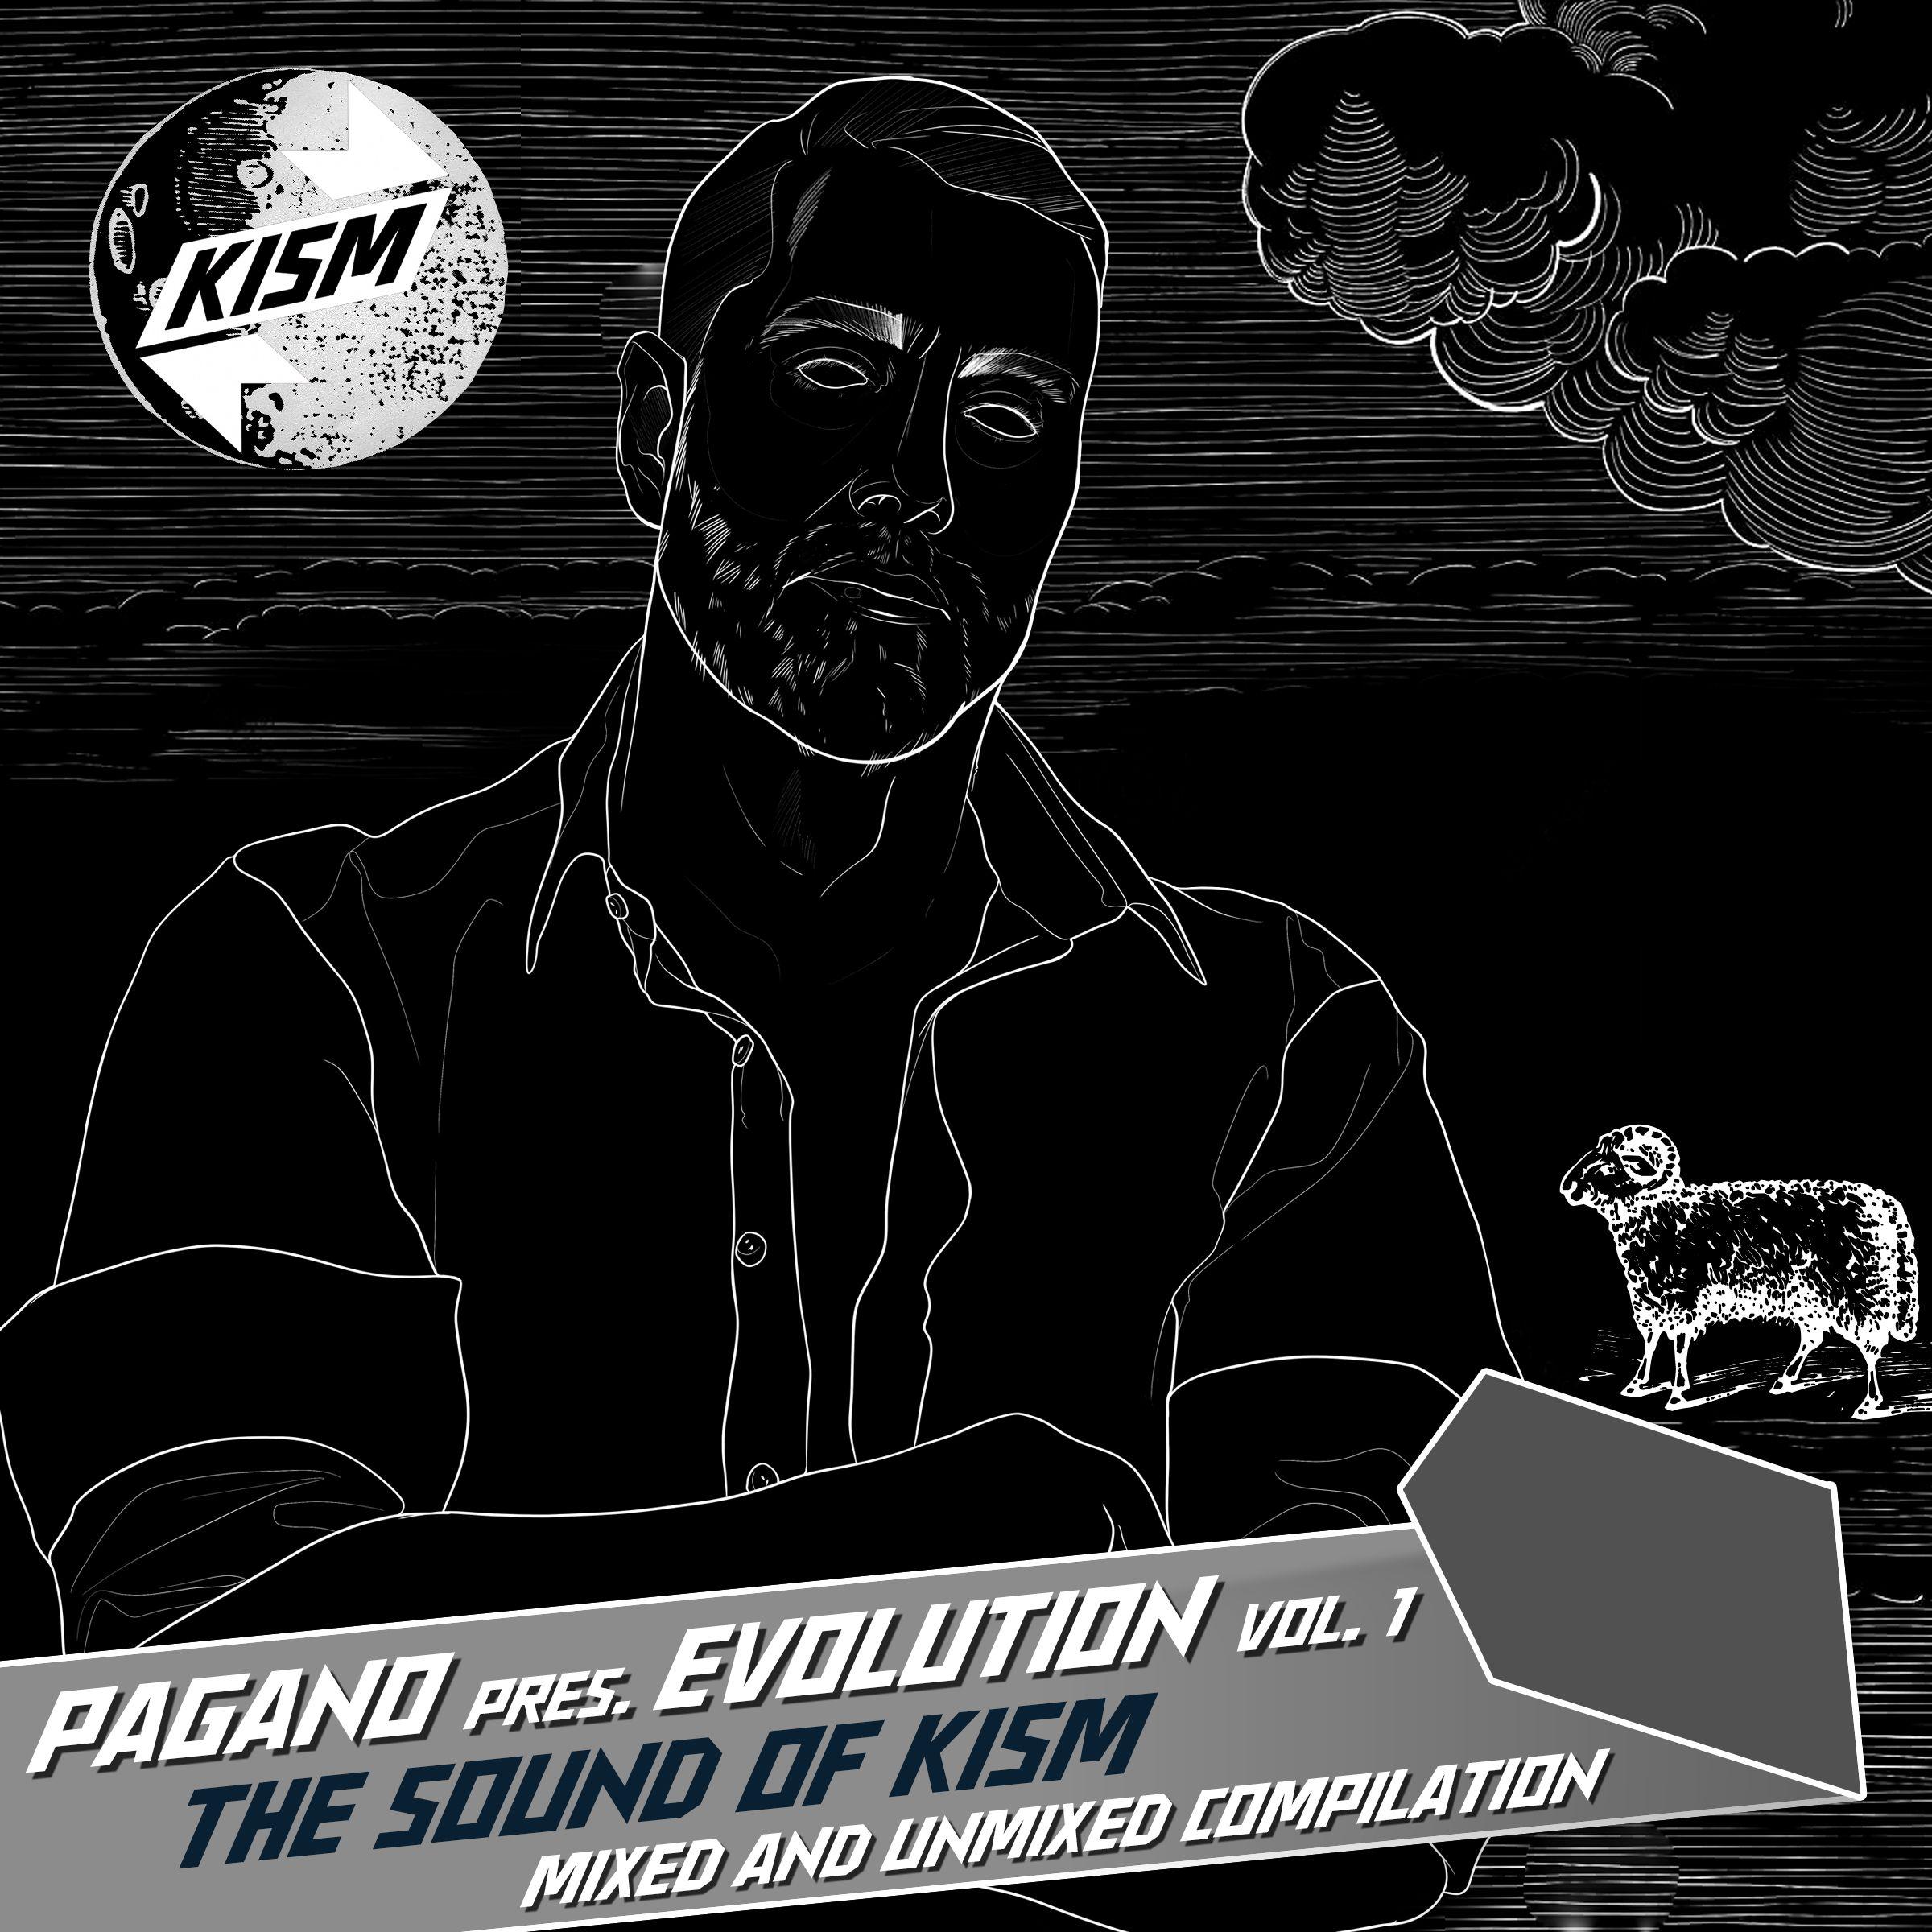 compilation_cover_-_pagano_pres_evolution_vol_1_-_kism011.jpg